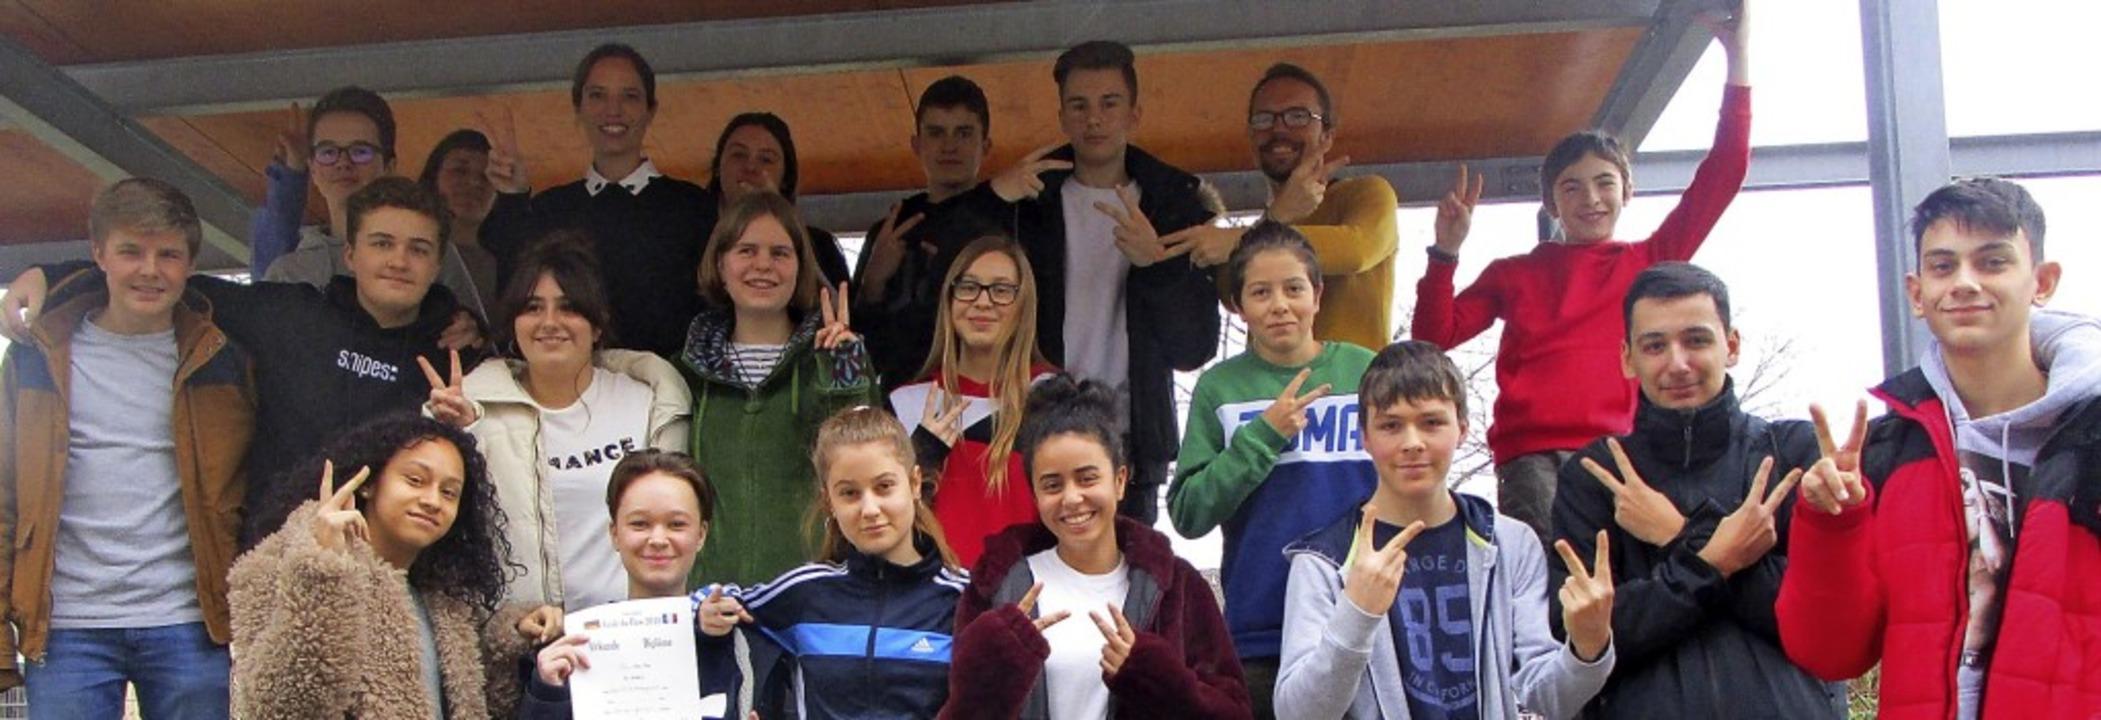 "Schüler der 9b am Oberrheingymnasium f... Projekt ""Ecole du Flow"".   | Foto: Röttinger"